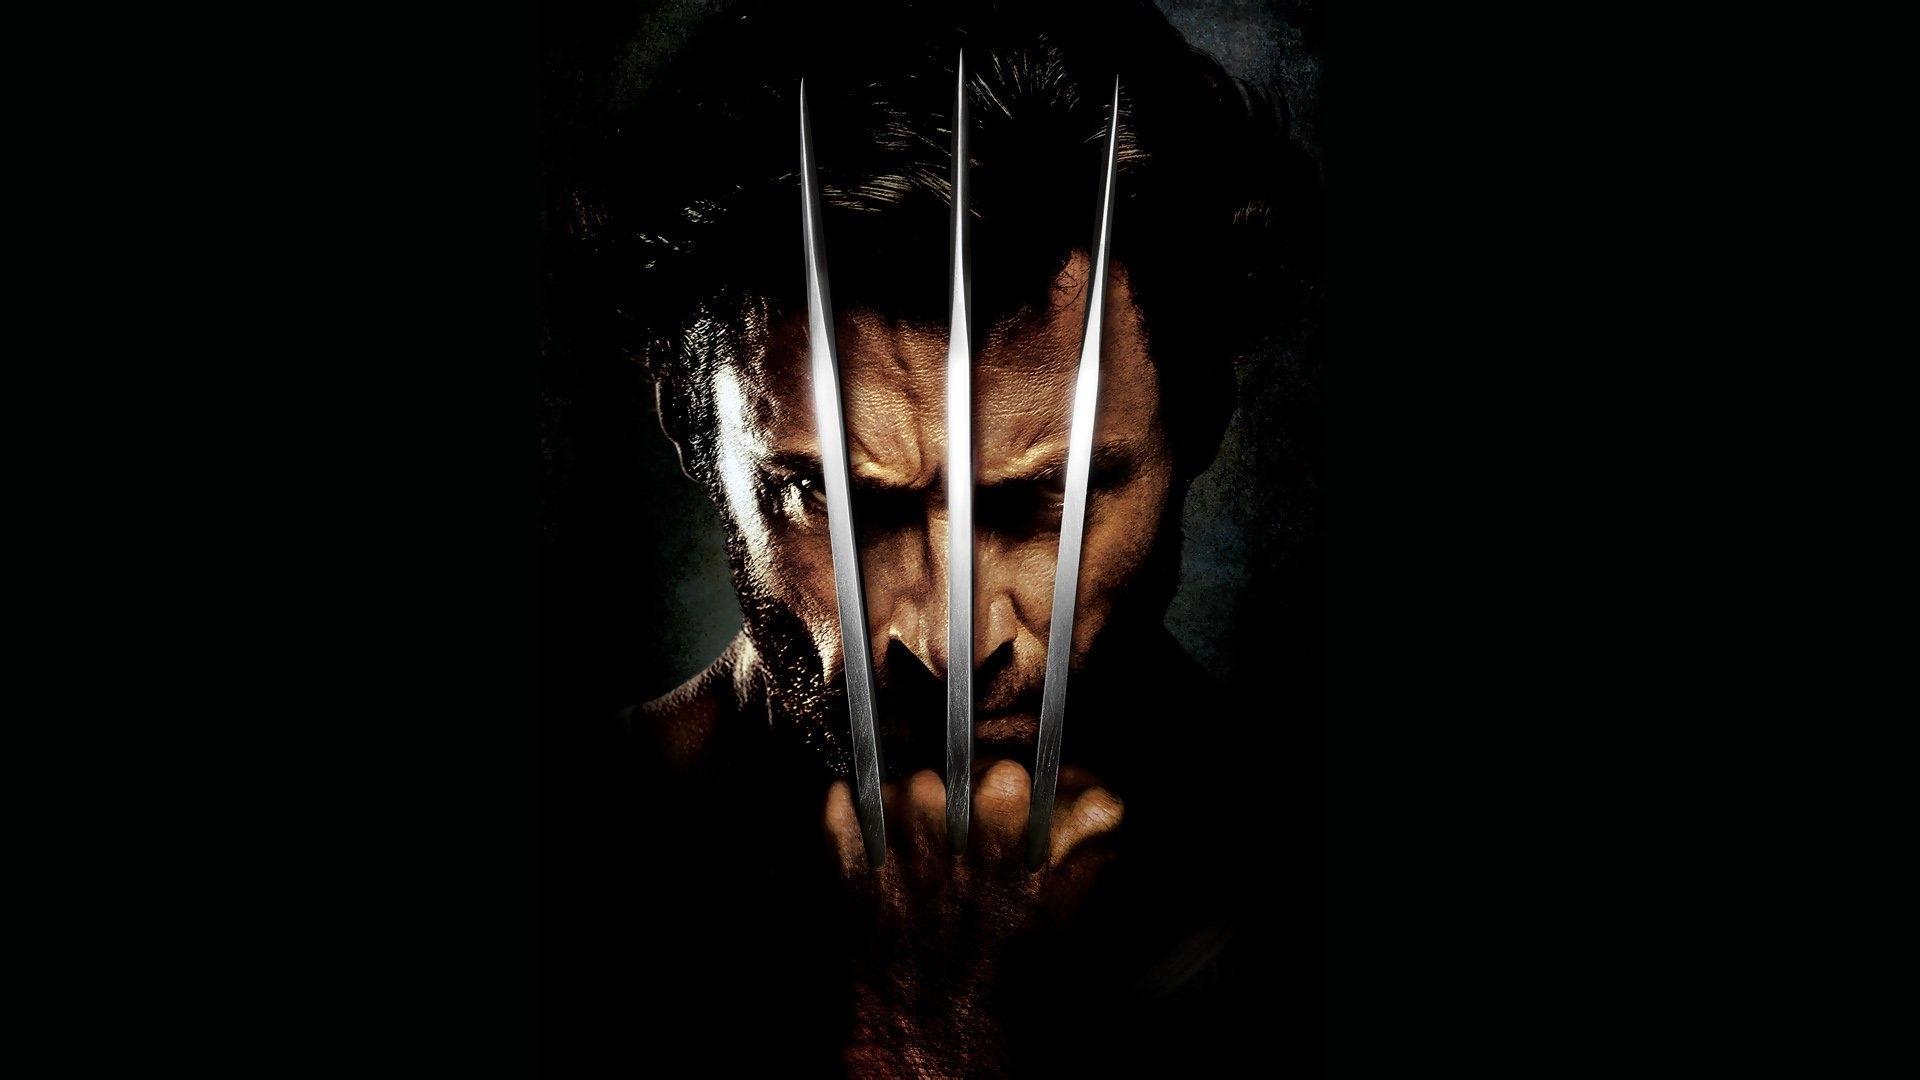 21 x-men origins: wolverine hd wallpapers | background images